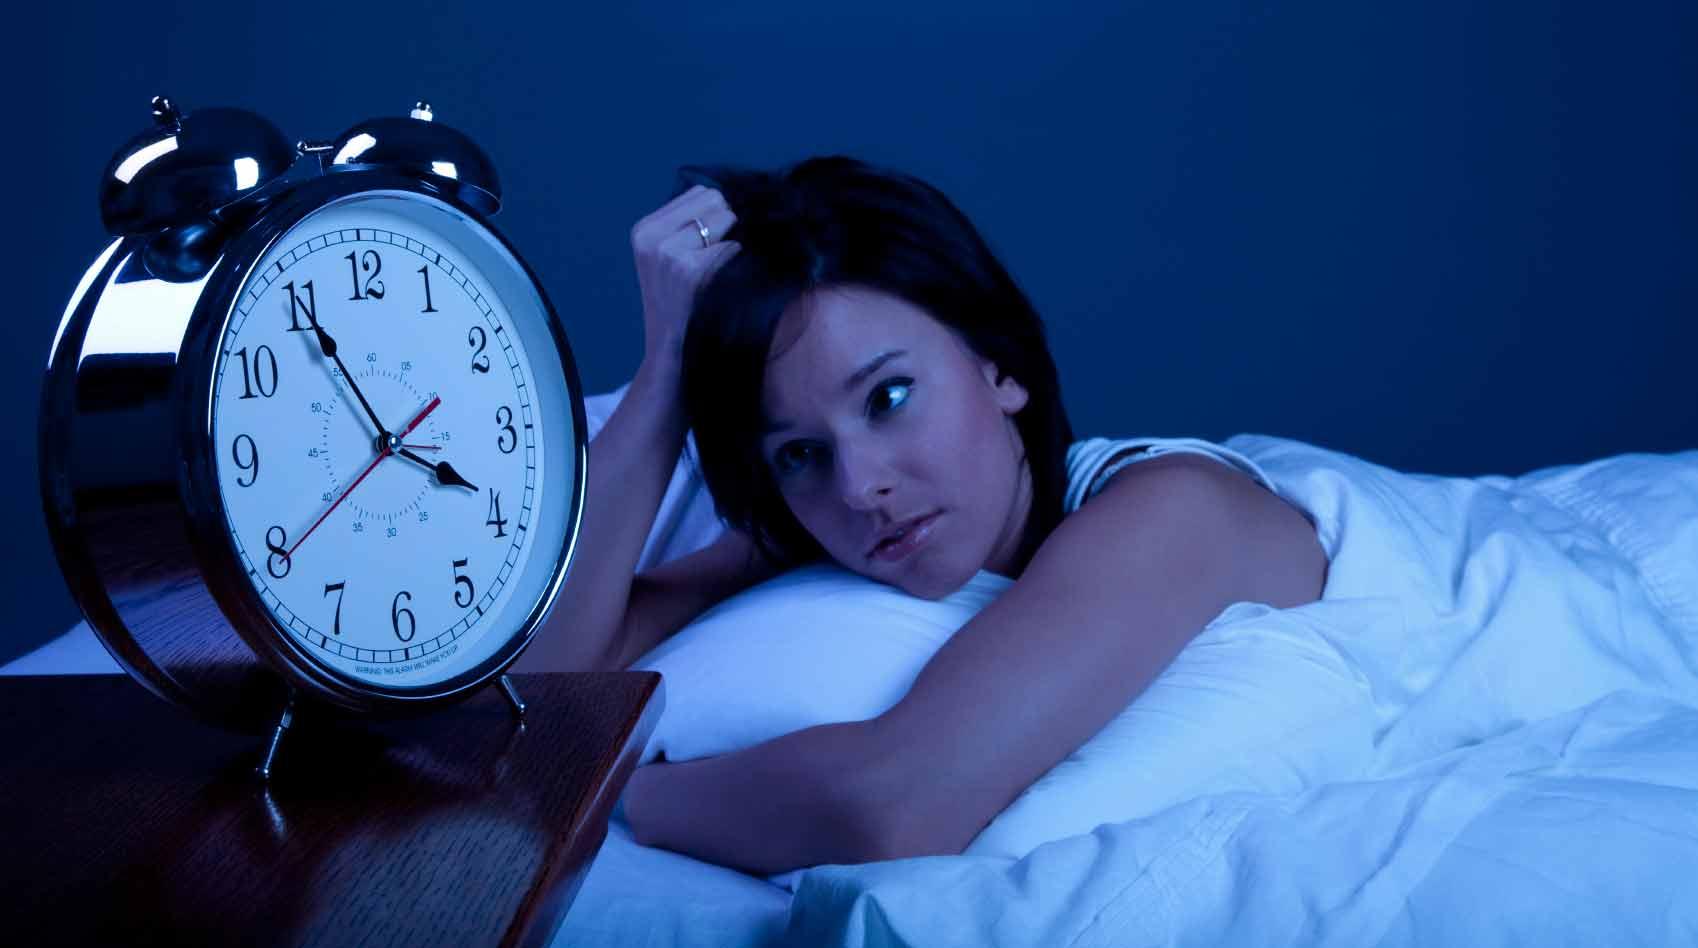 безсоння, бессонница, причины бессонницы